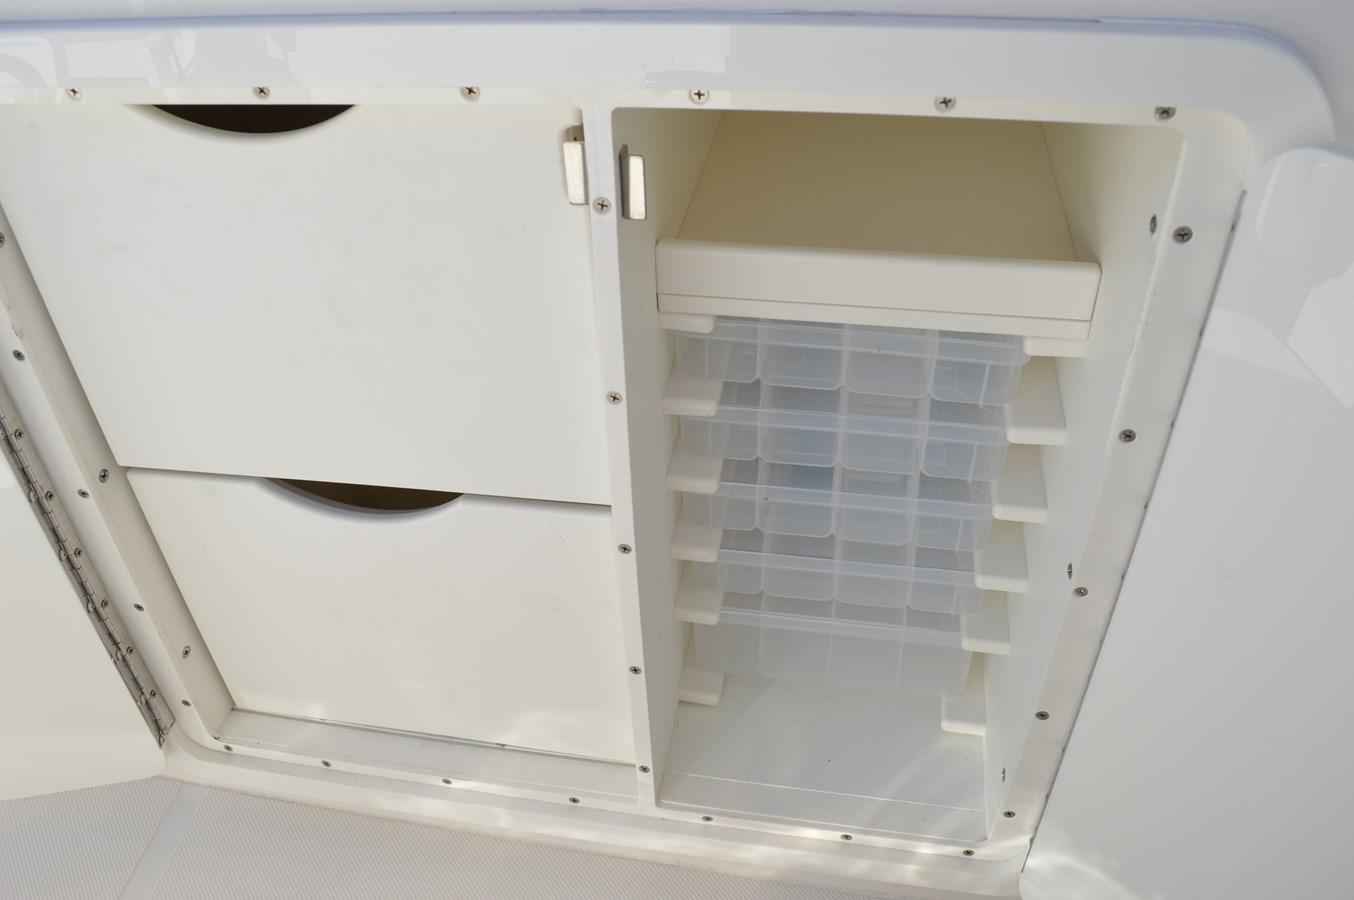 Storage Bins and Tackle Boxes - 38 JUPITER For Sale